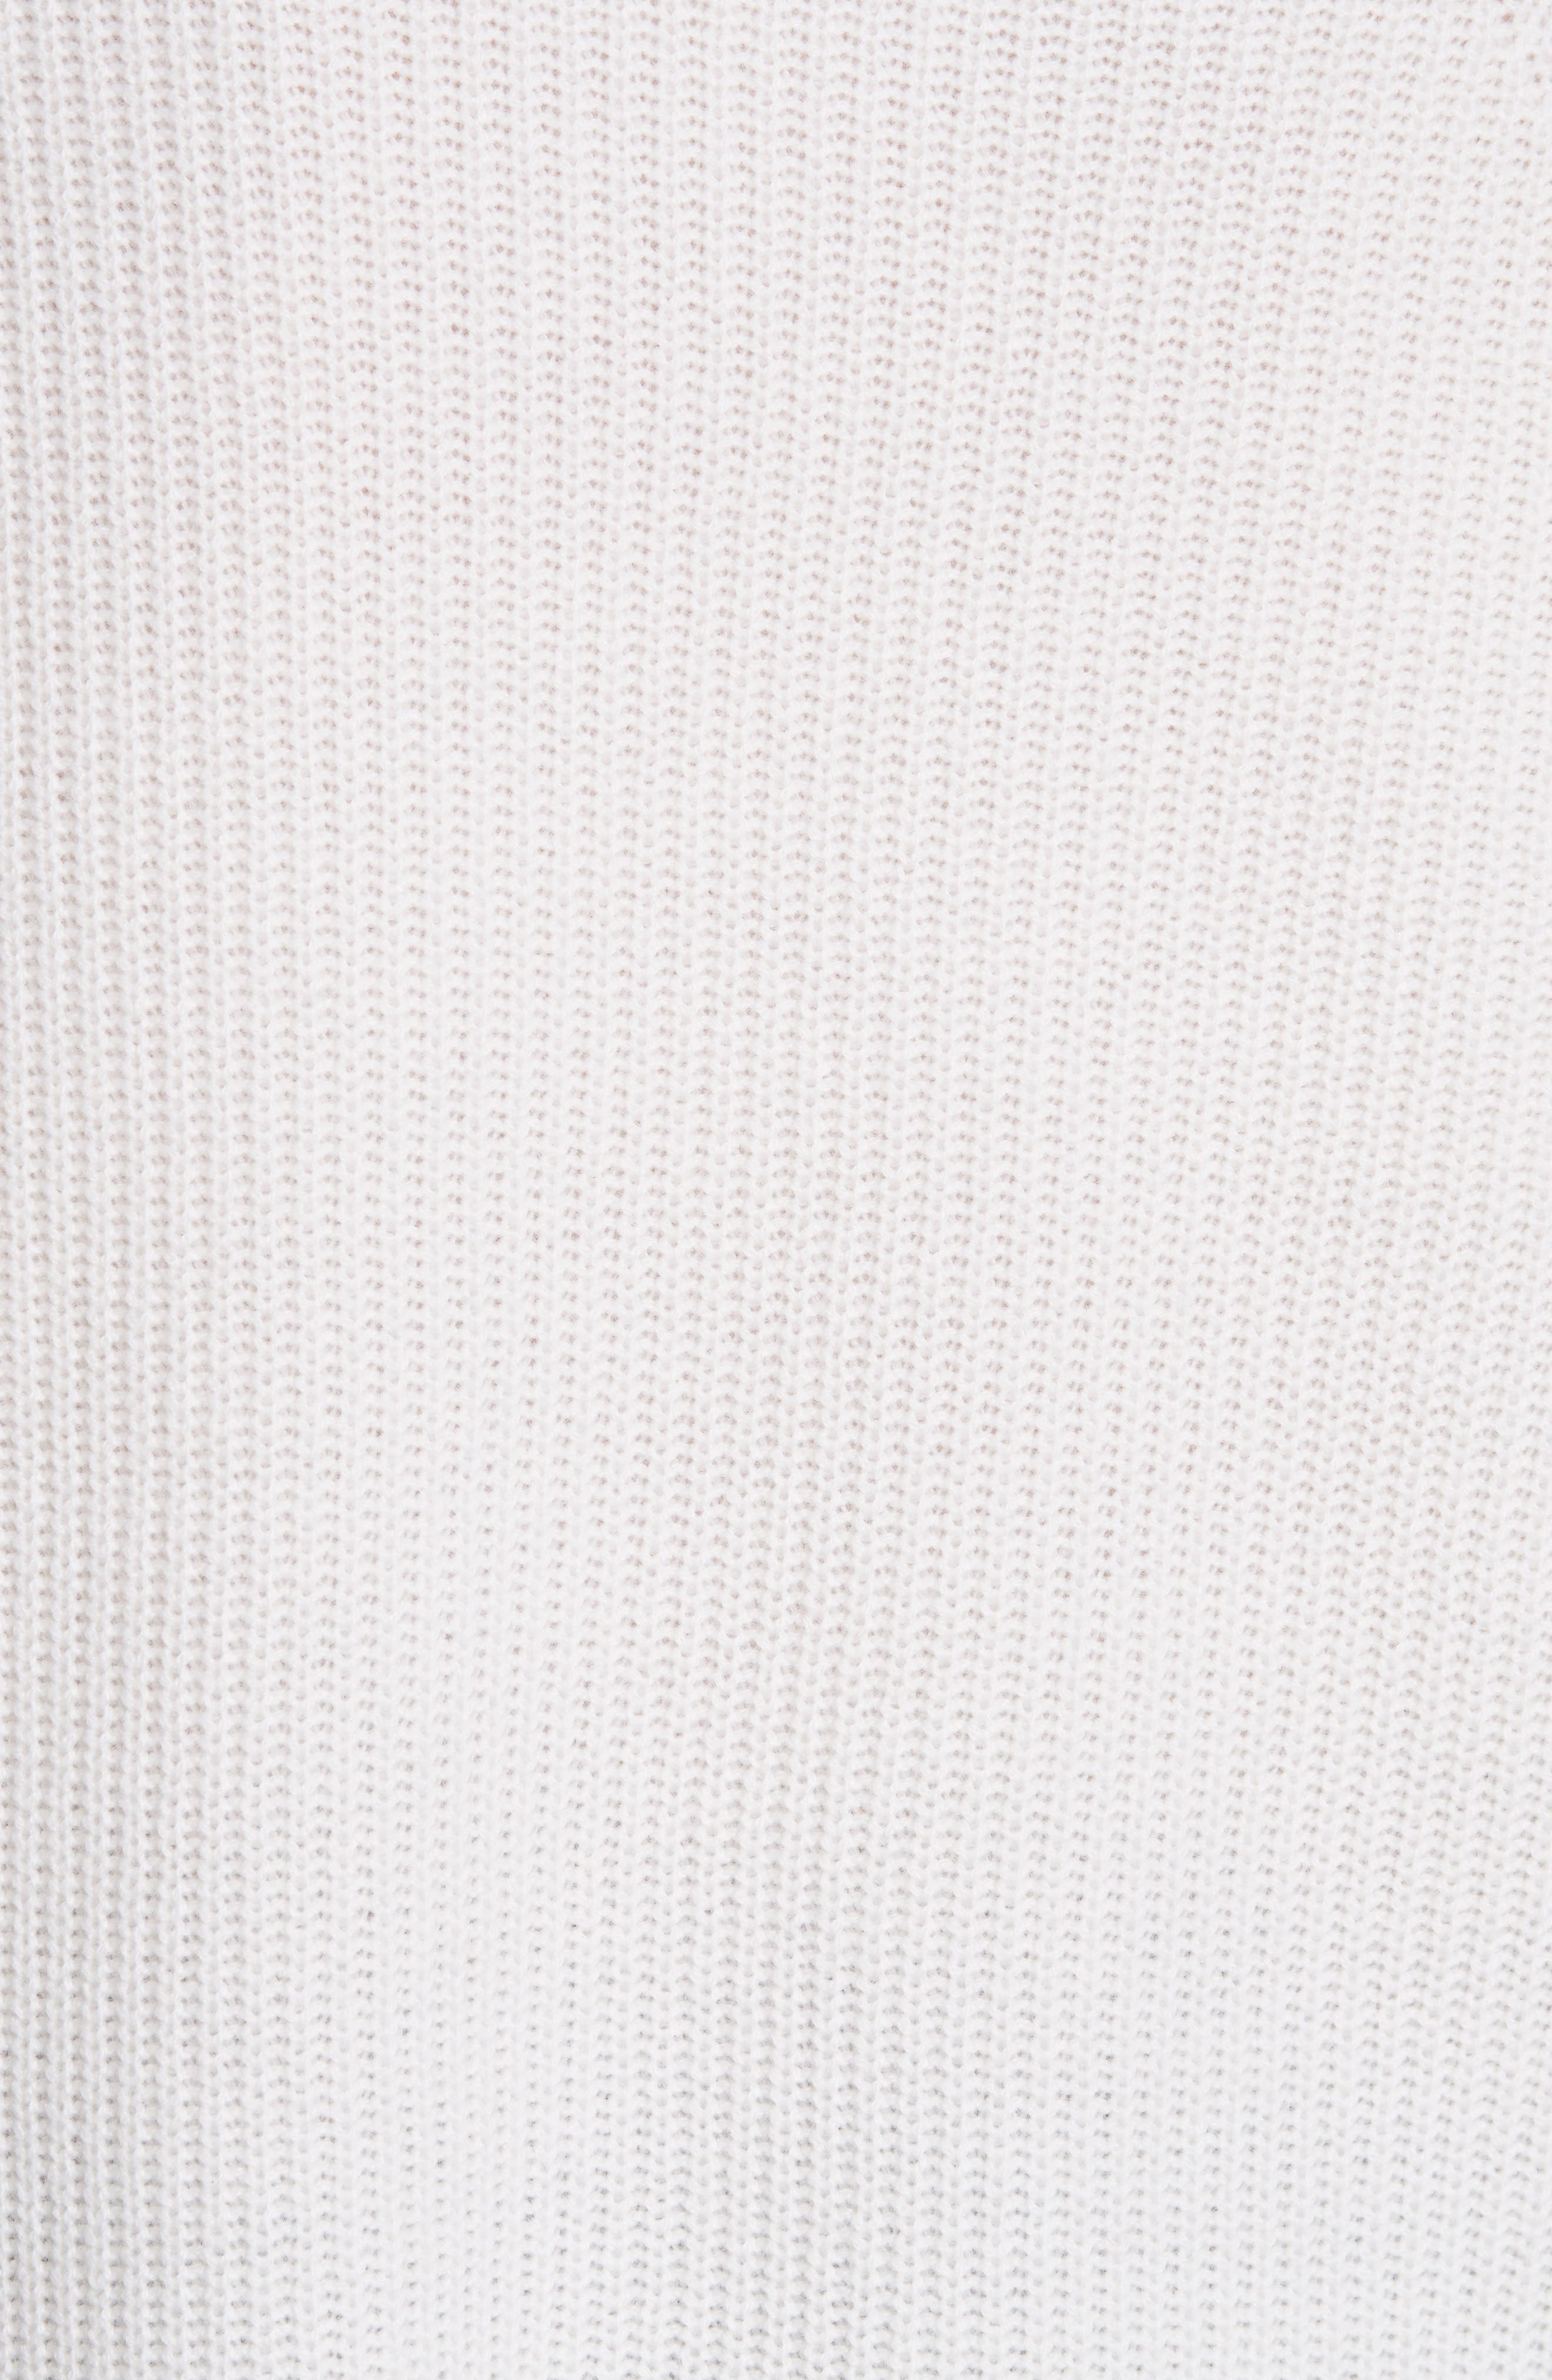 Fisherman Crewneck Cashmere Sweater,                             Alternate thumbnail 5, color,                             IVORY